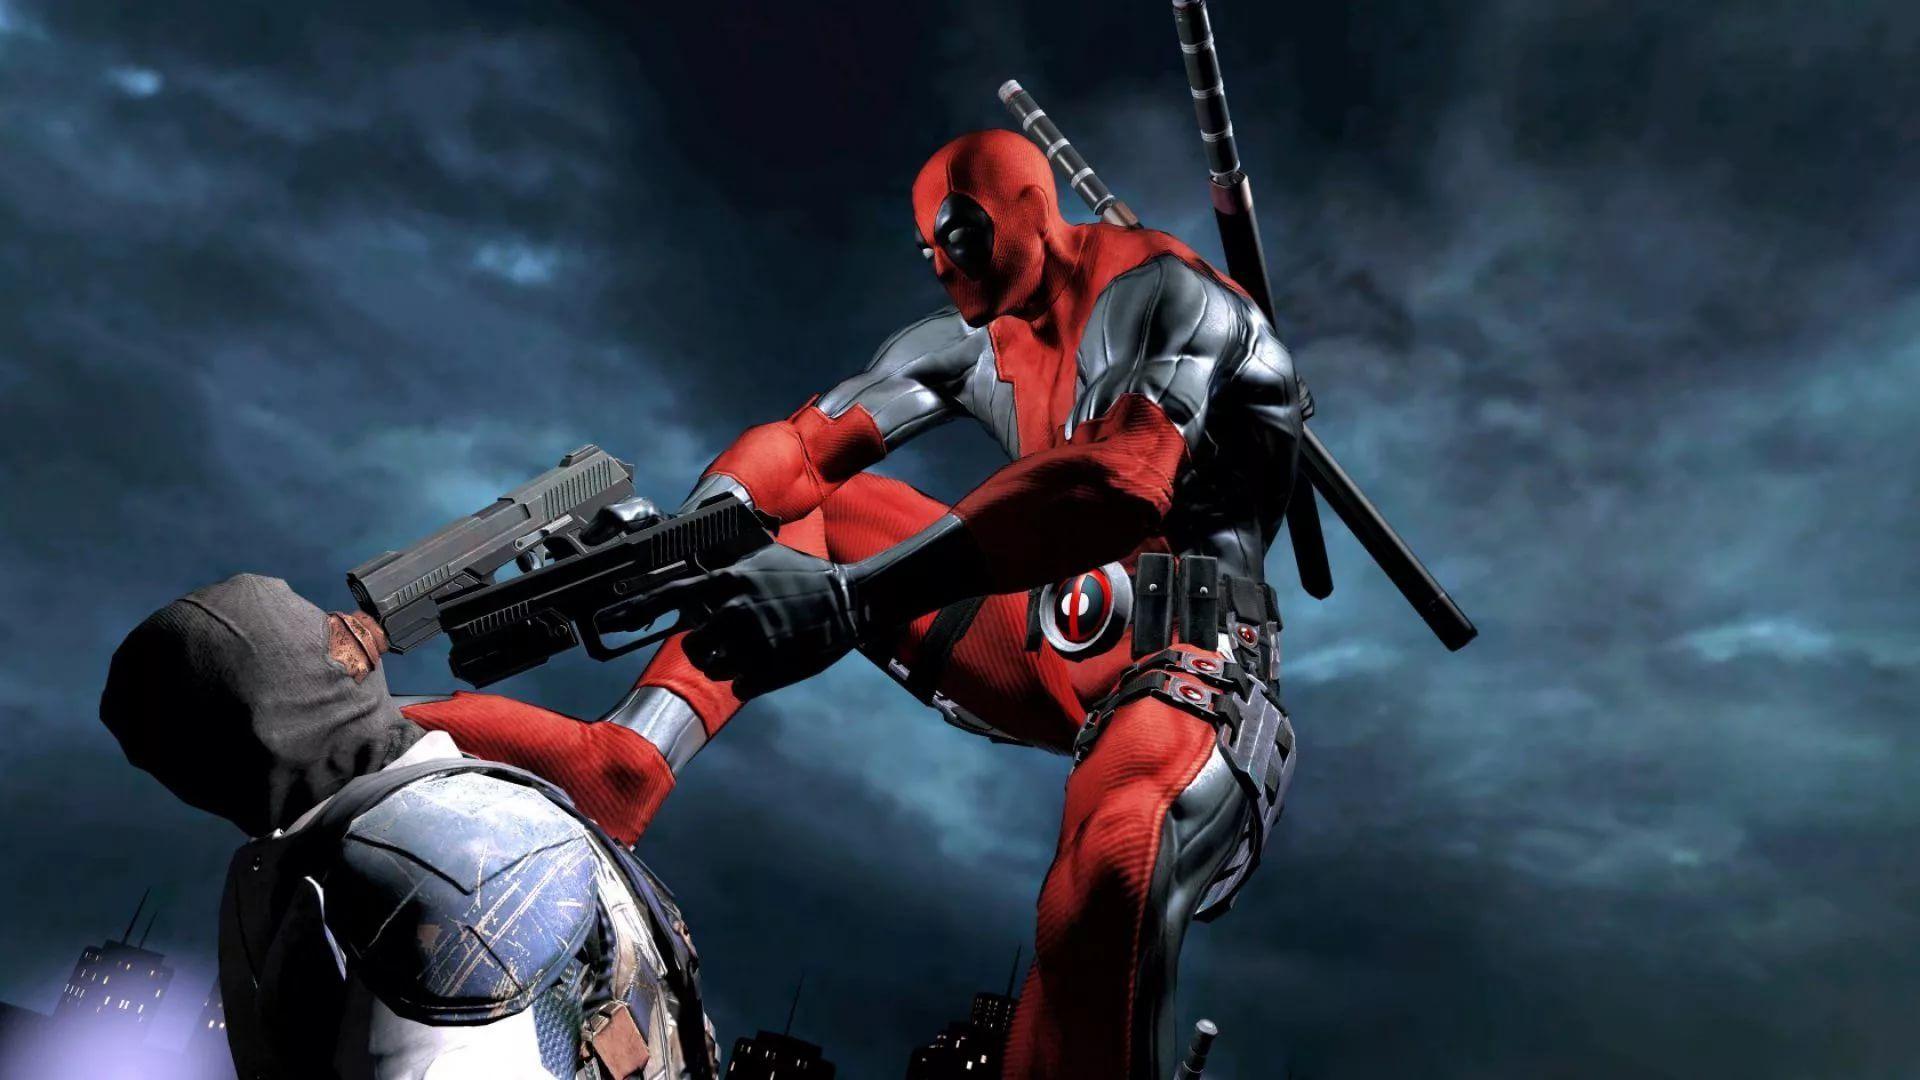 Cool Deadpool Background Wallpaper